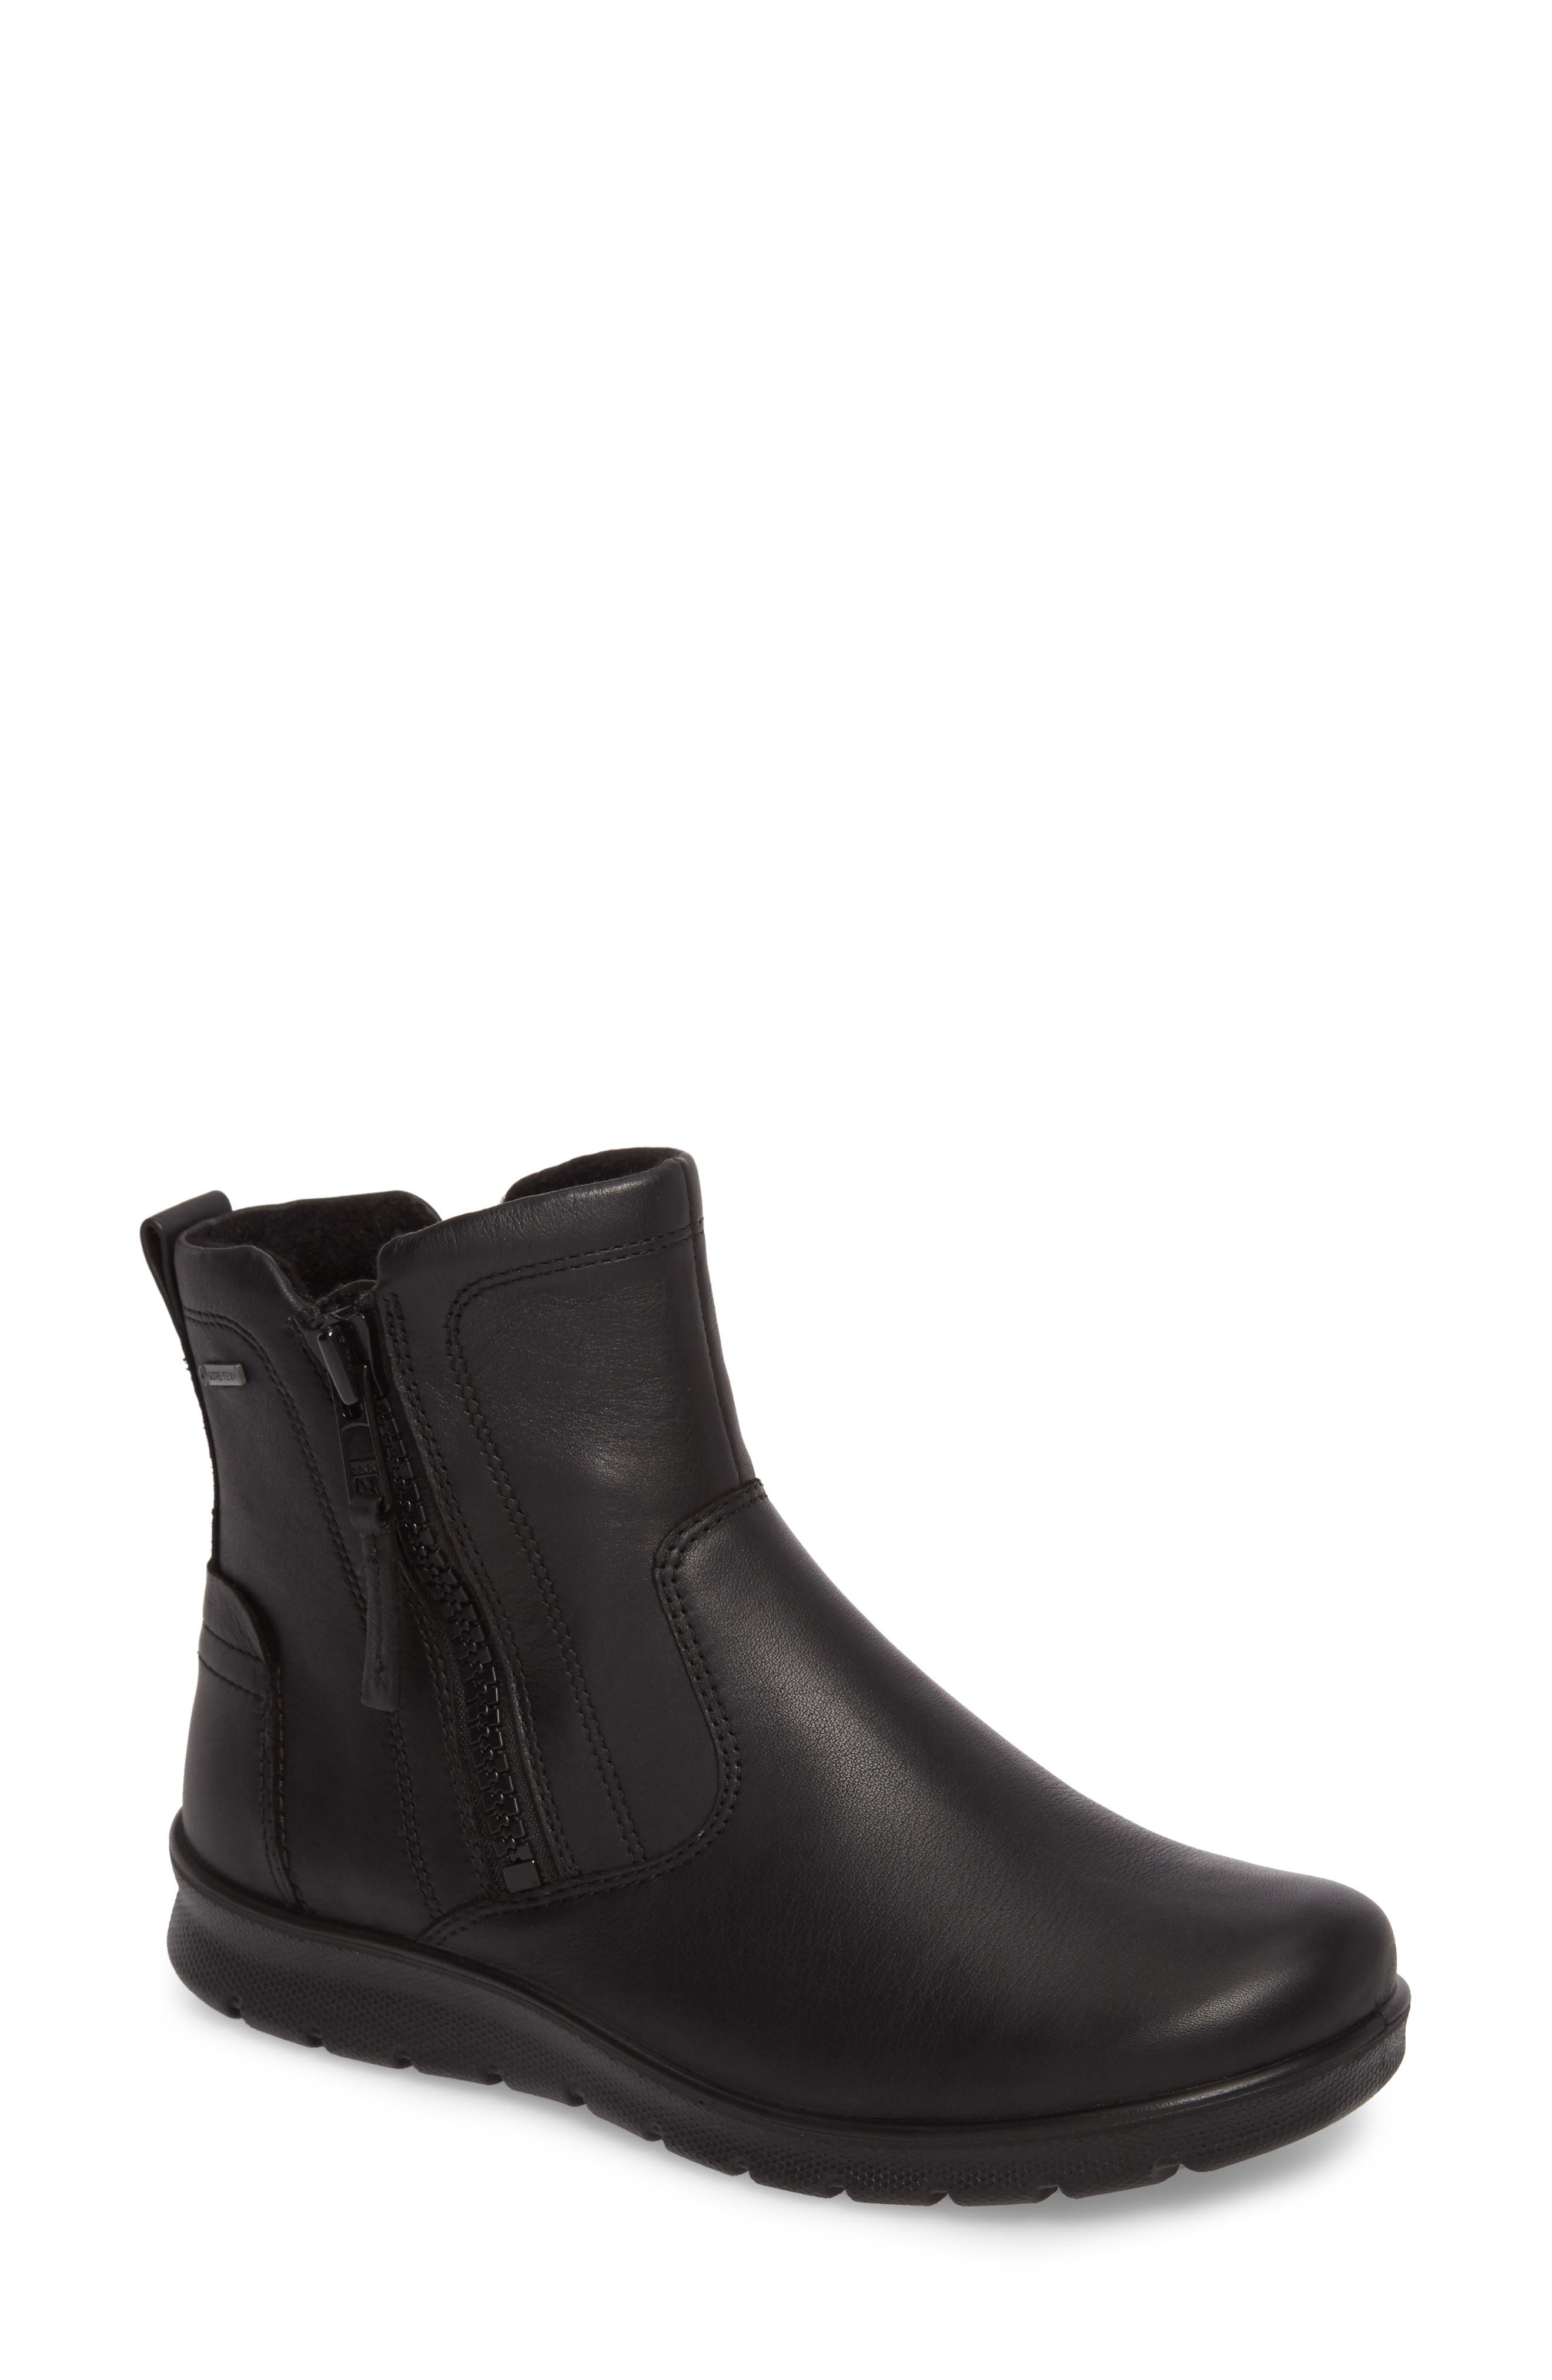 Babett Gore-Tex<sup>®</sup> Bootie,                         Main,                         color, Black Leather